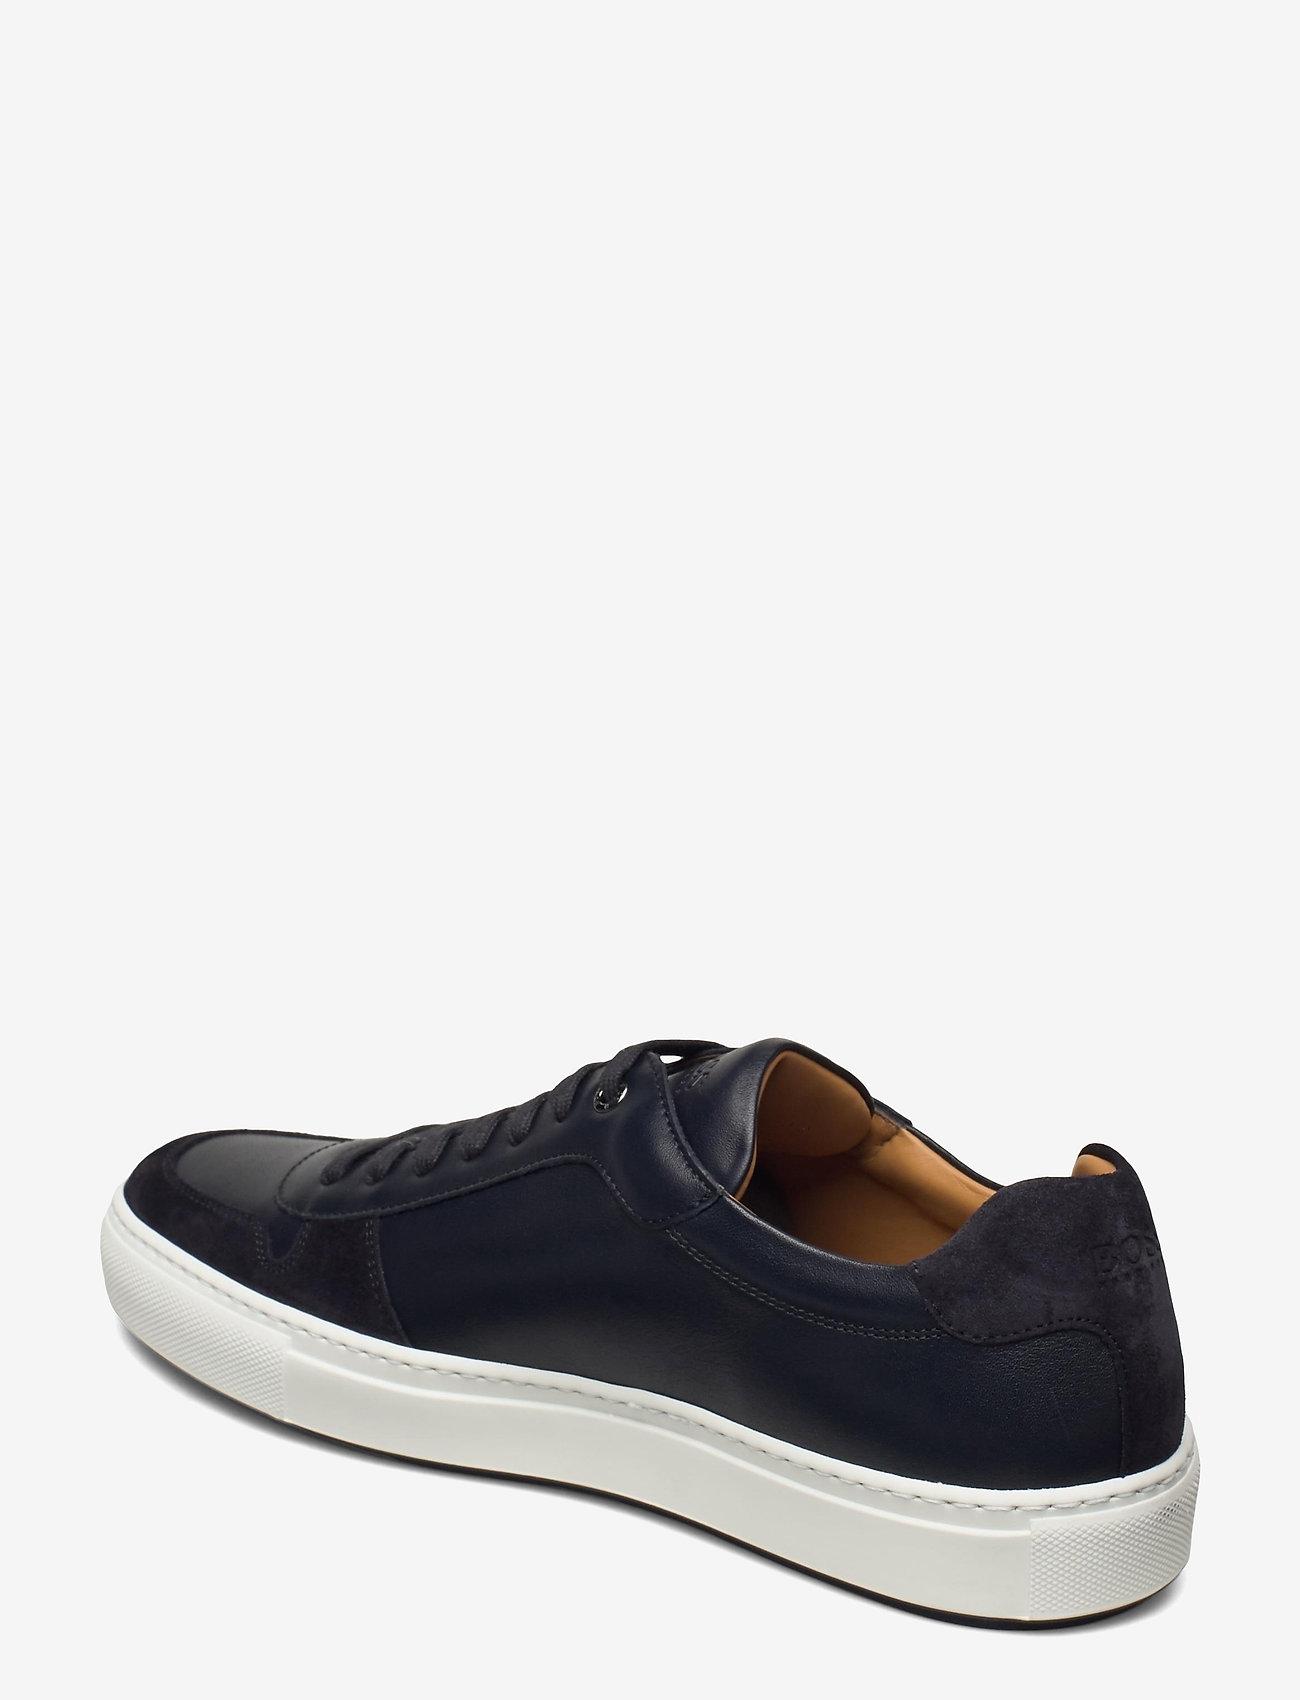 BOSS - Mirage_Tenn_oxns - låga sneakers - dark blue - 2